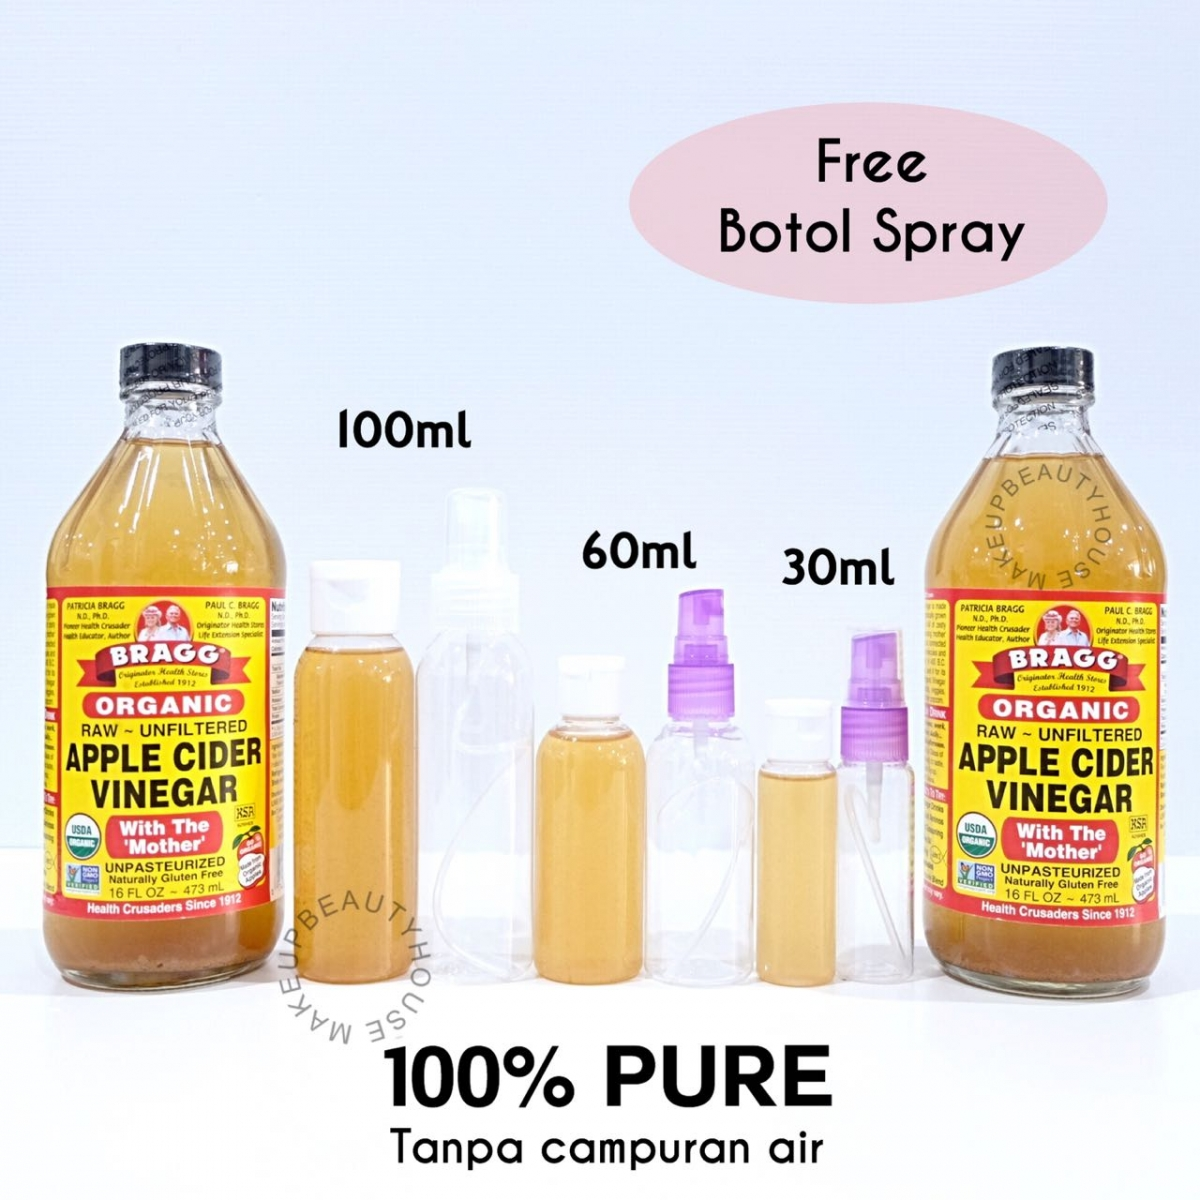 BRAGG. Apple Cider Vinegar ...